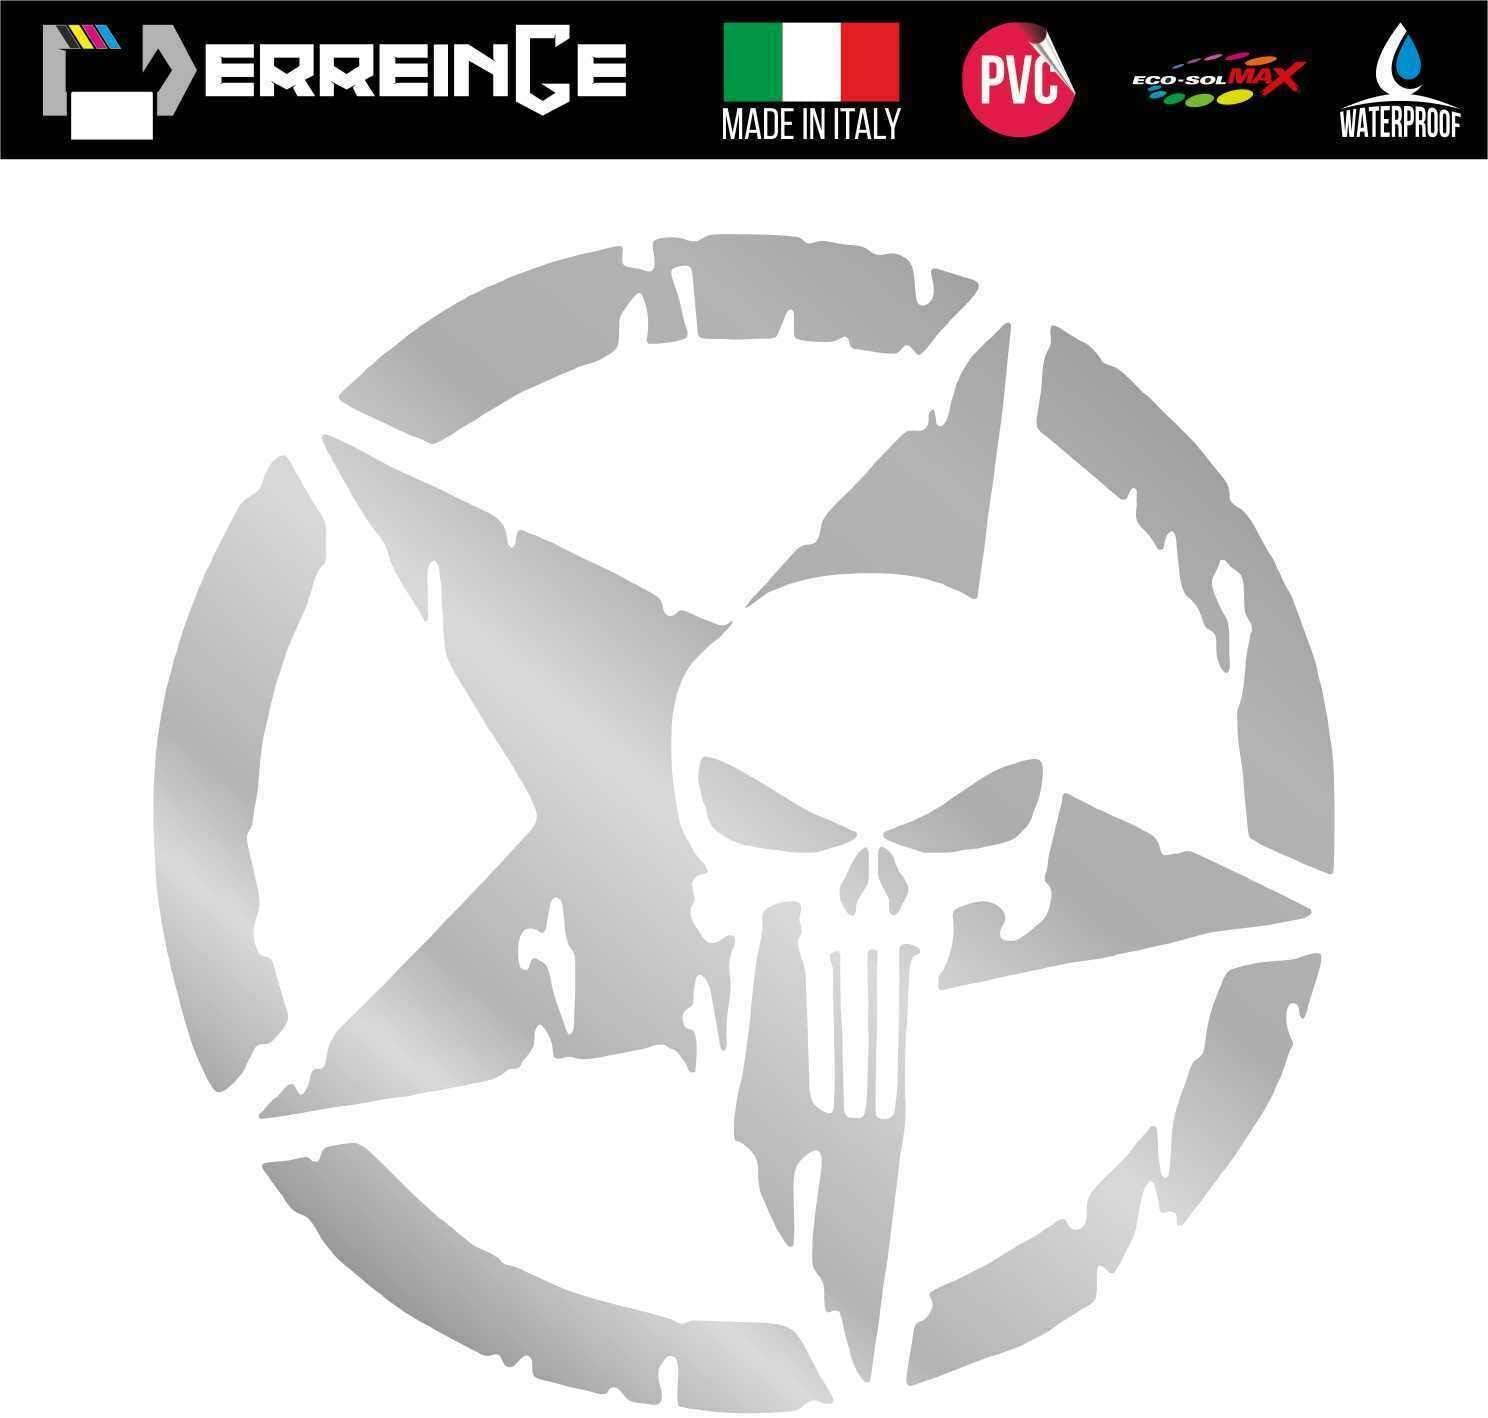 cm 15 erreinge Sticker Punisher MILIT/ÄRSTAR Army BLAU PVC vorbeabstandete Aufkleber f/ür Wall Decal Aufkleber Wall Car Motorrad Helm Camper Laptop